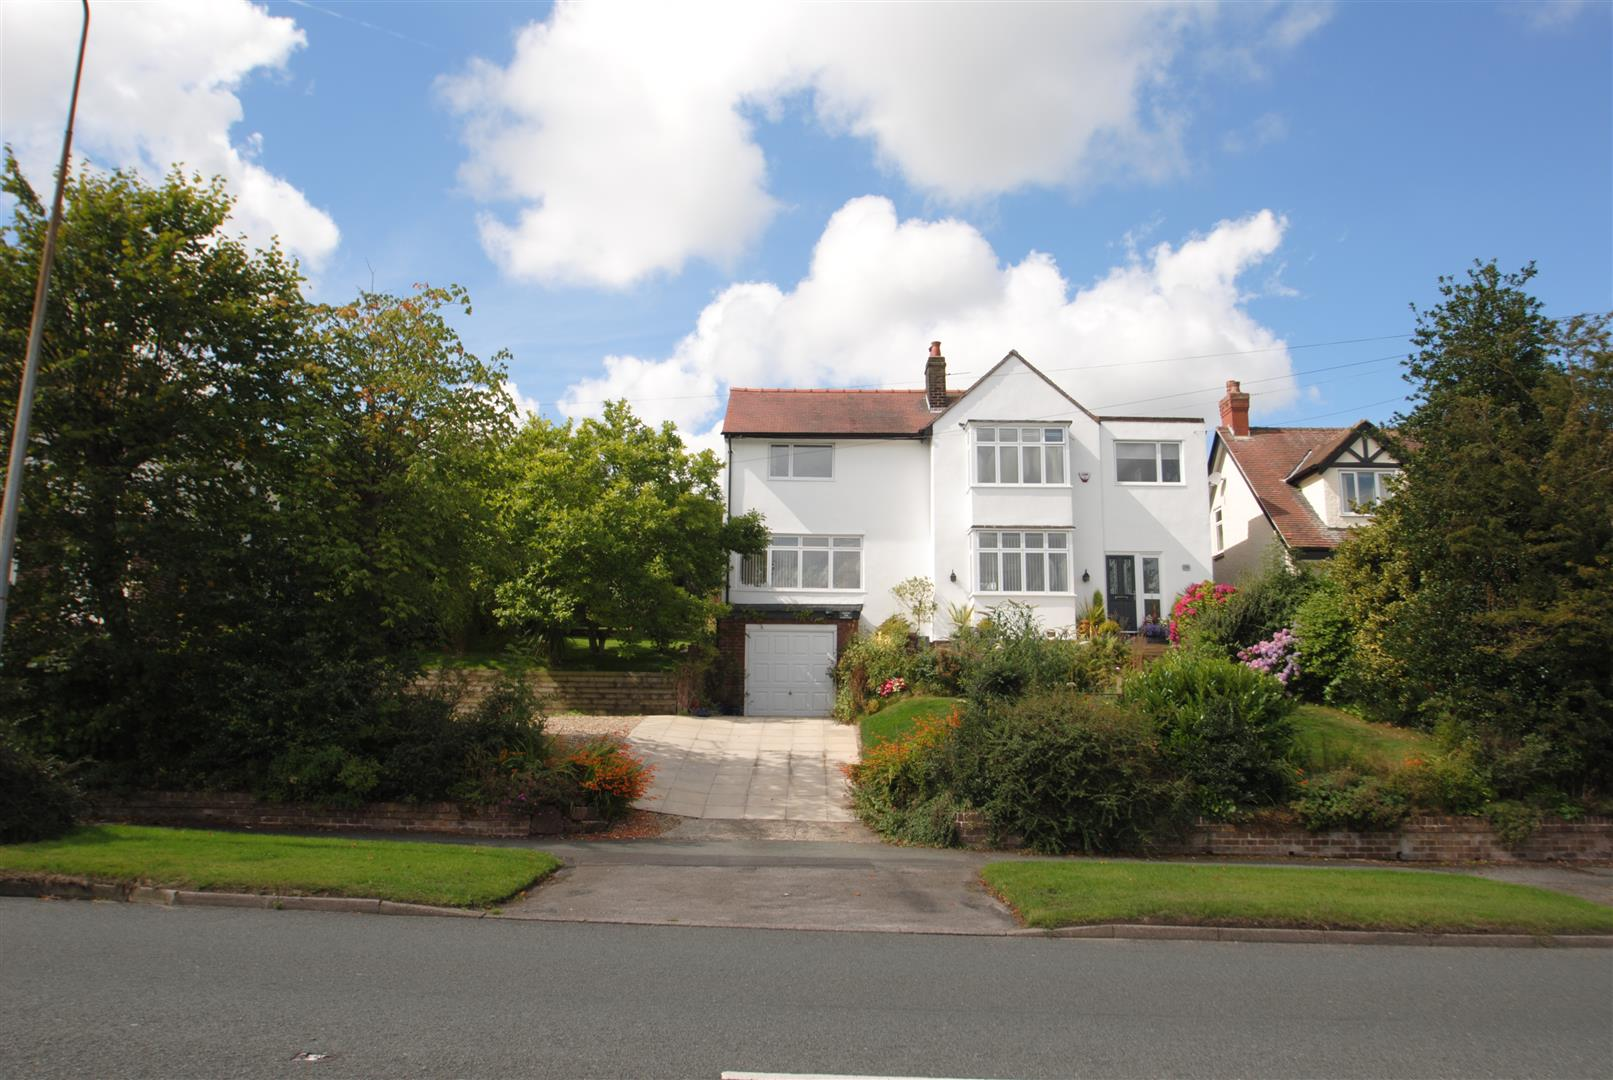 4 Bedrooms Property for sale in London Road, APPLETON, WARRINGTON, WA4